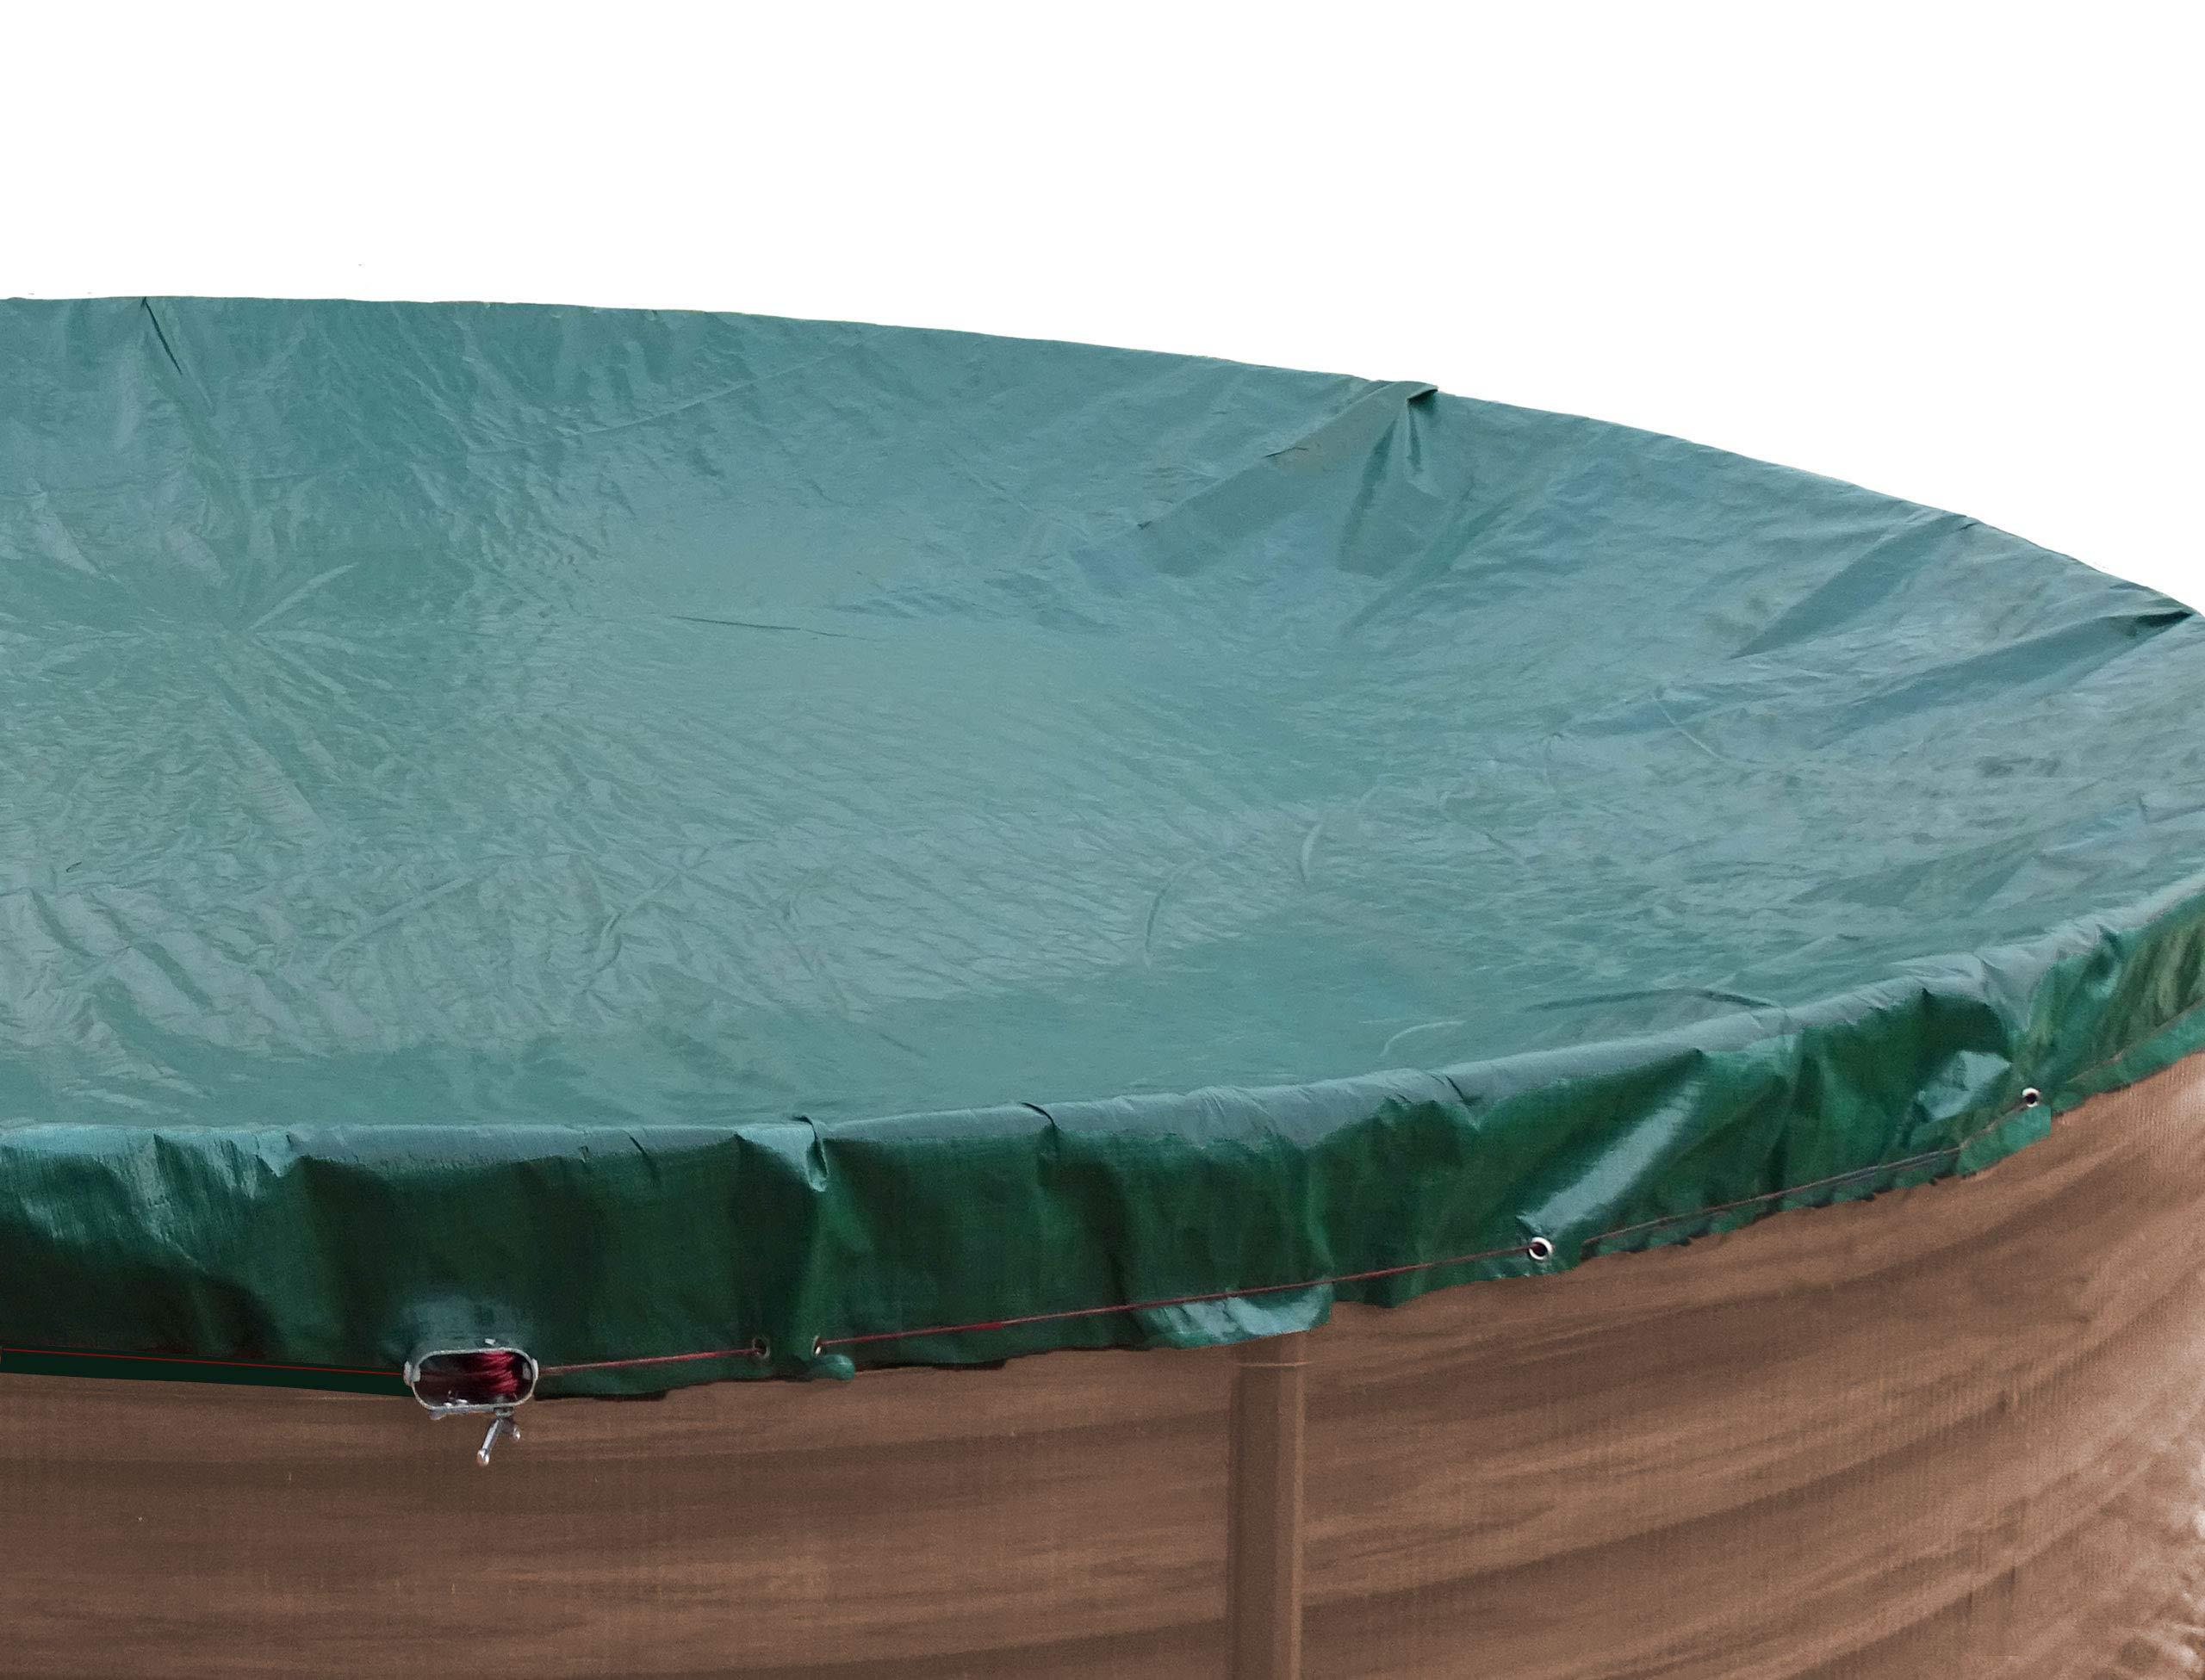 QUICK STAR Cubierta de piscina de invierno redonda 180g / m² para ...